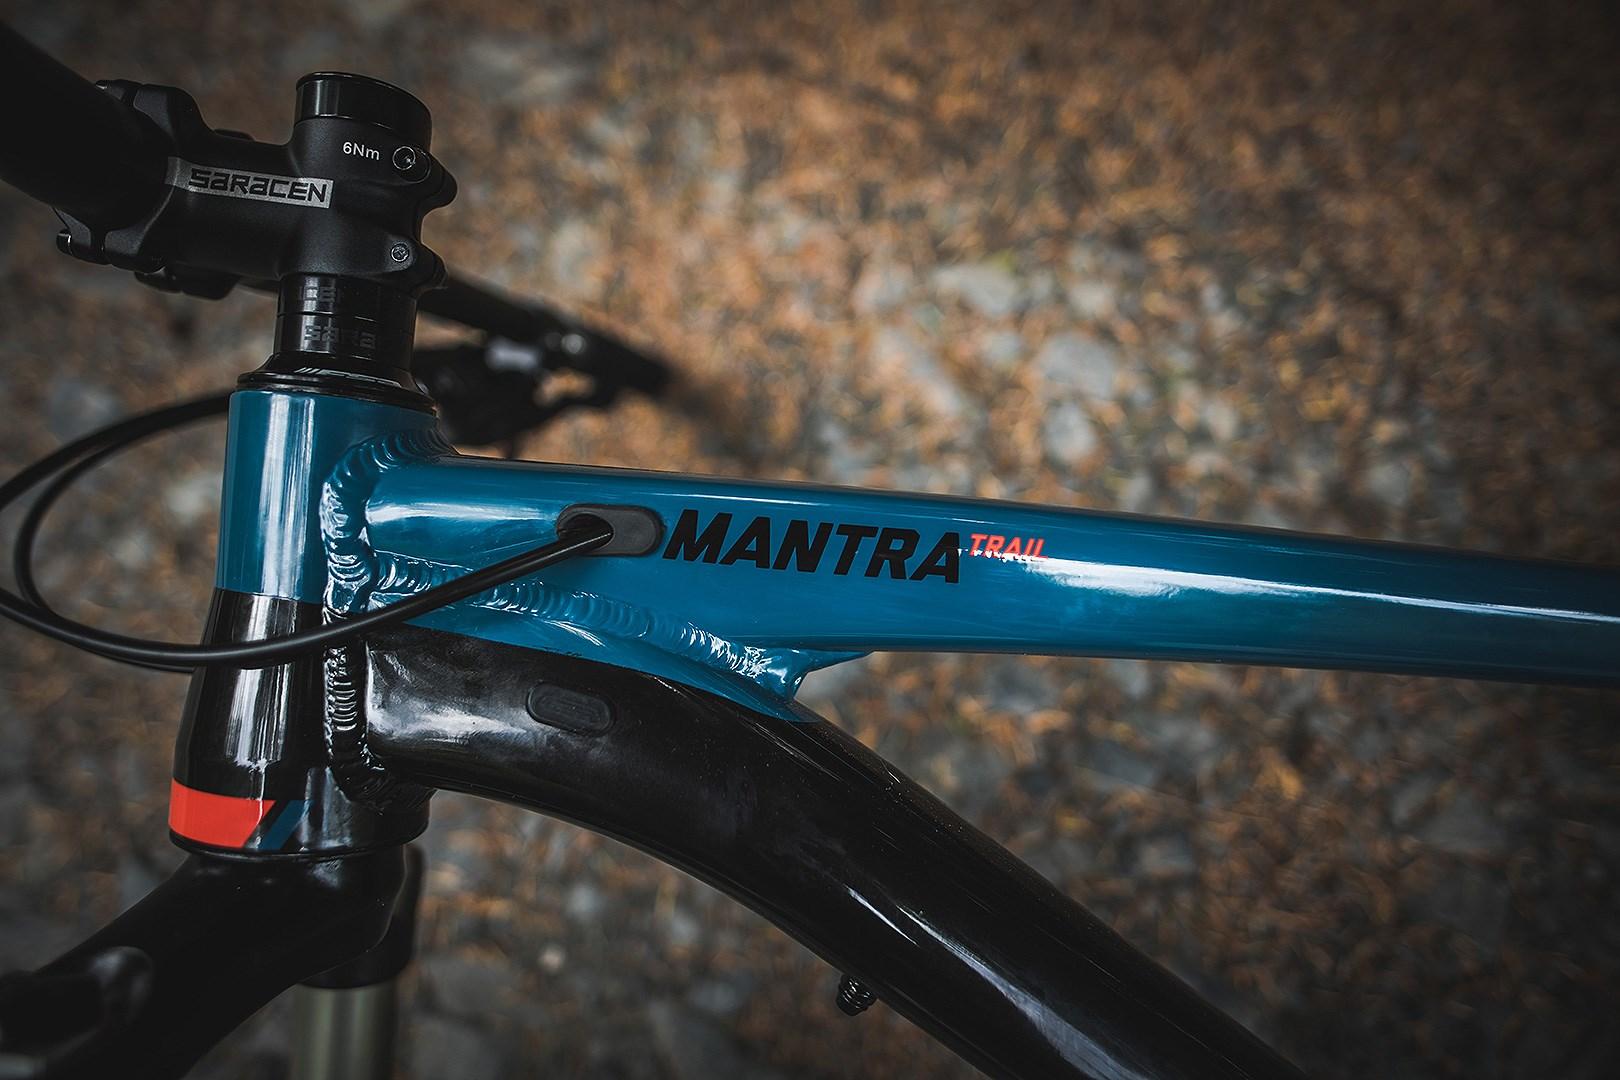 Fair Trading Licence Check >> 2018 Saracen Mantra Trail Hardtail Mountain Bike £719.99